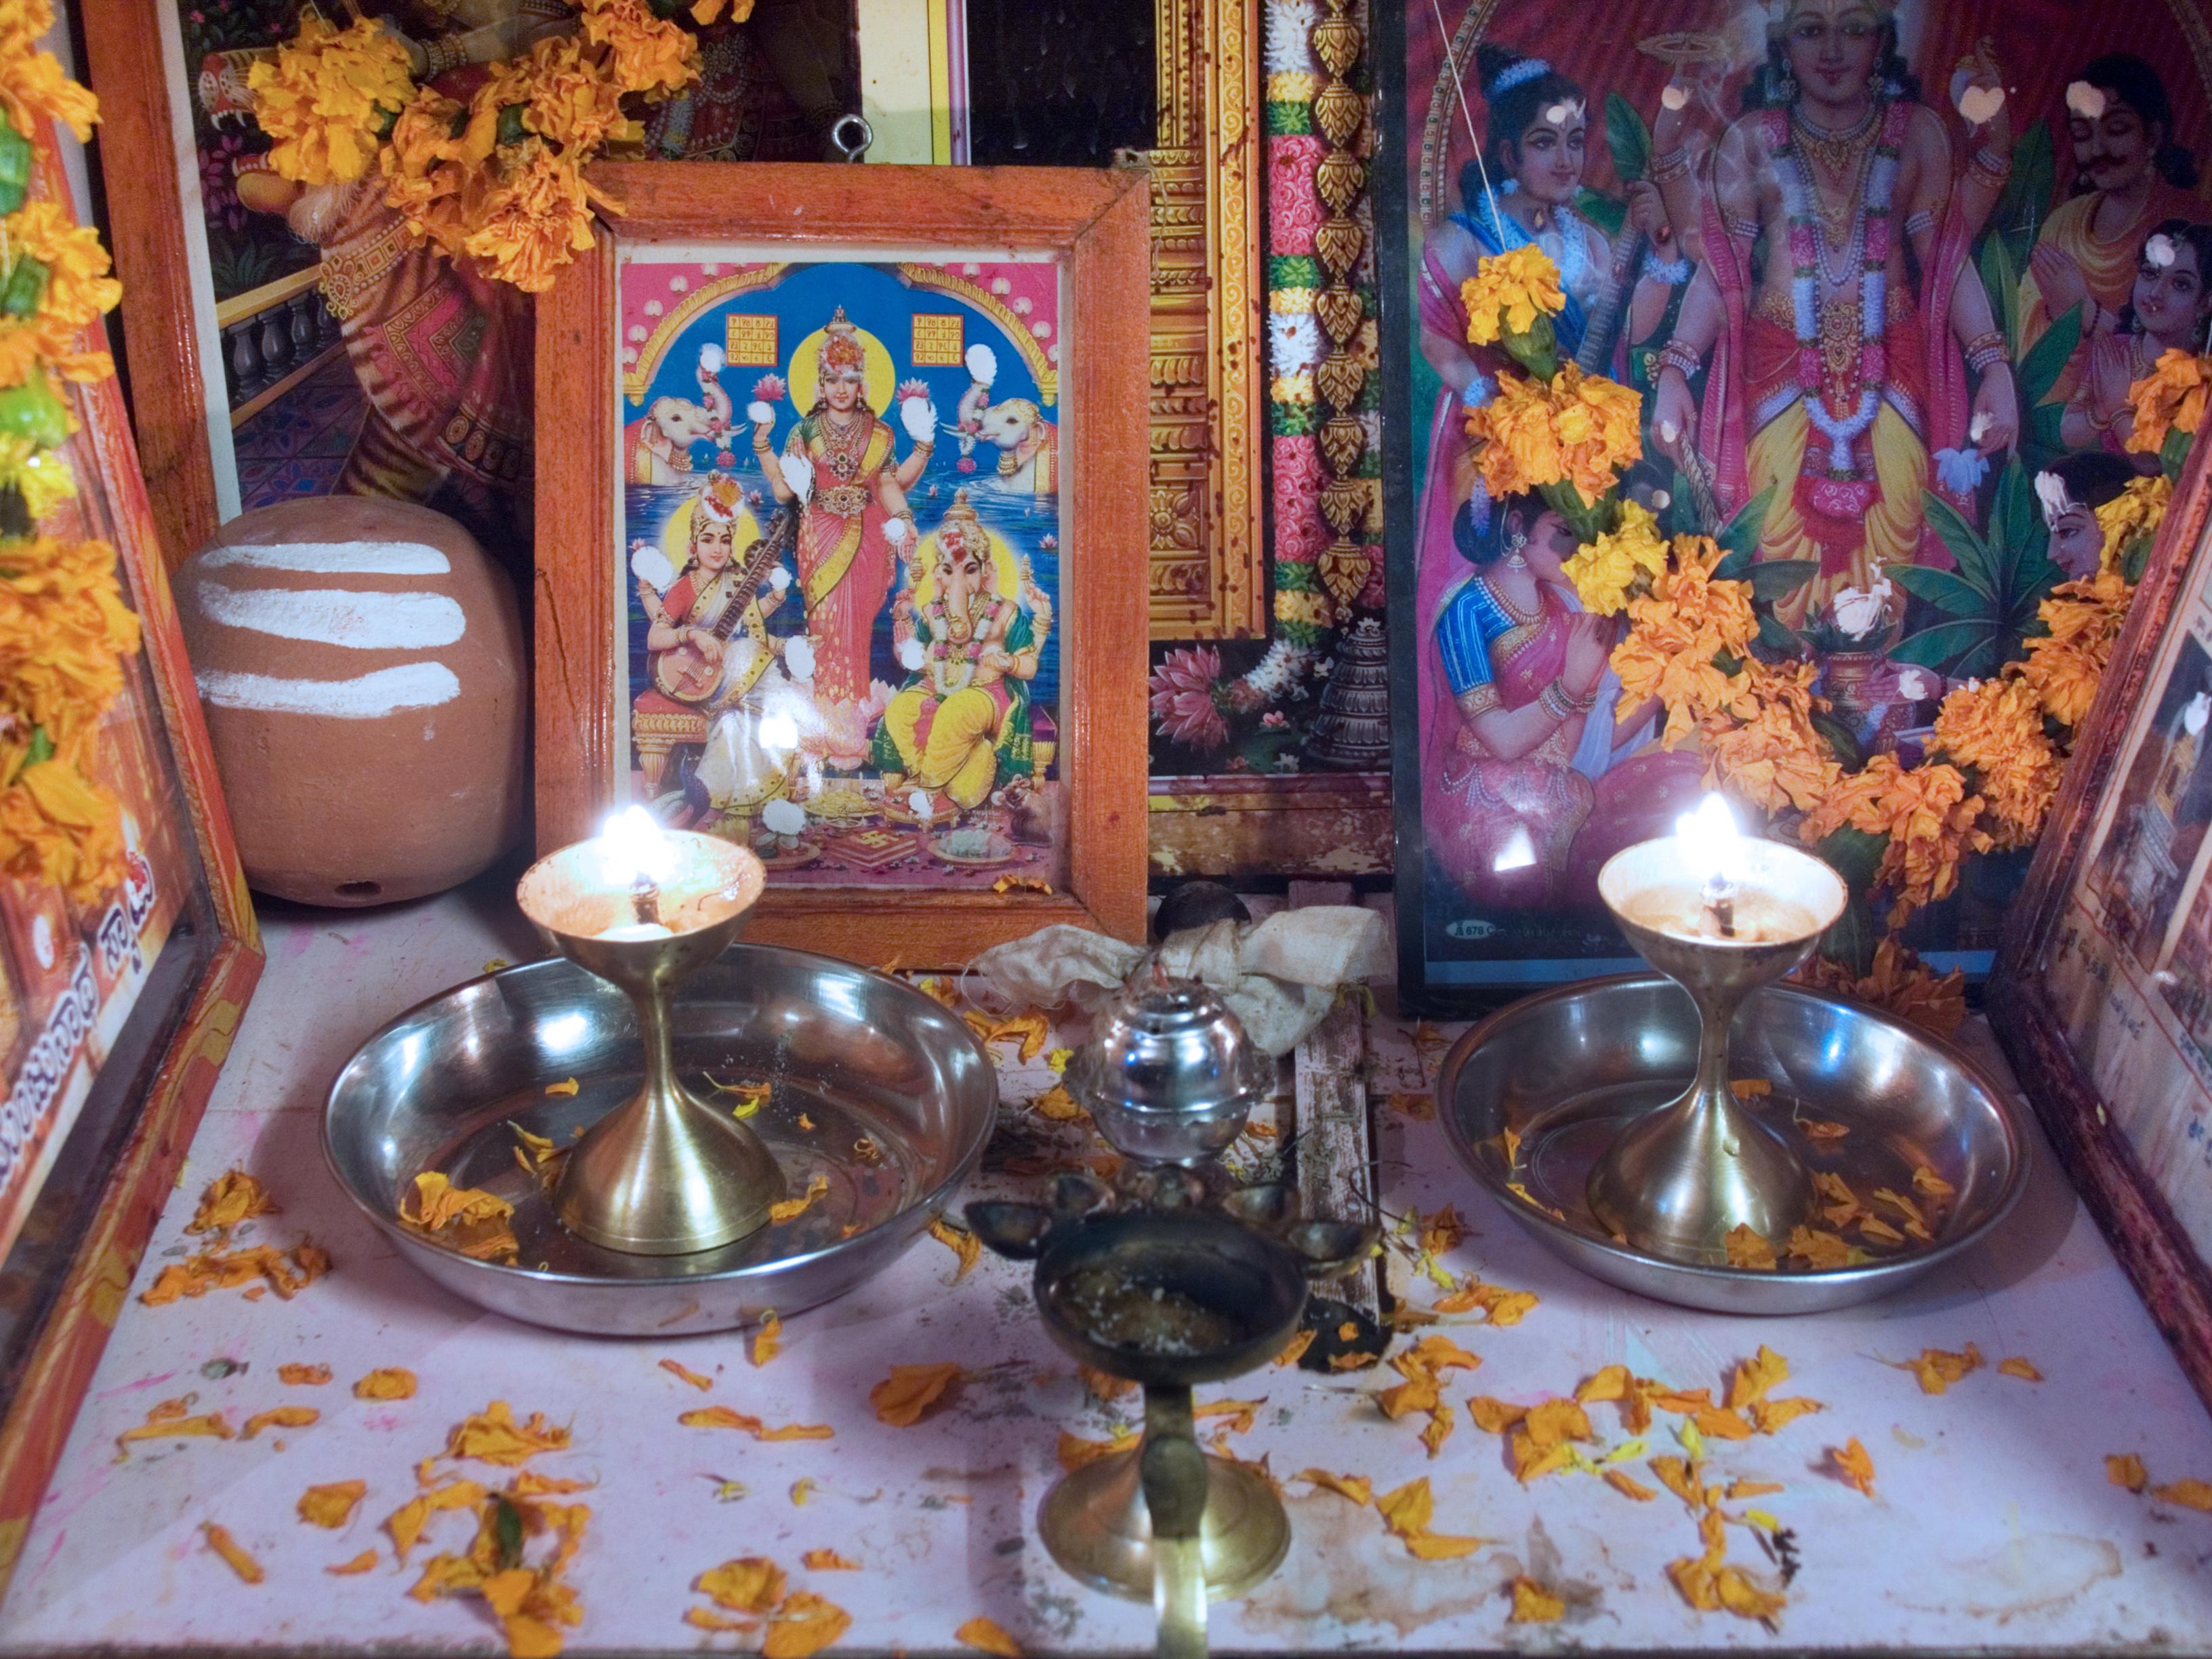 Best Kitchen Gallery: Hinduism Societal Impact World Religions Museum of Hindu Altar At Home on rachelxblog.com